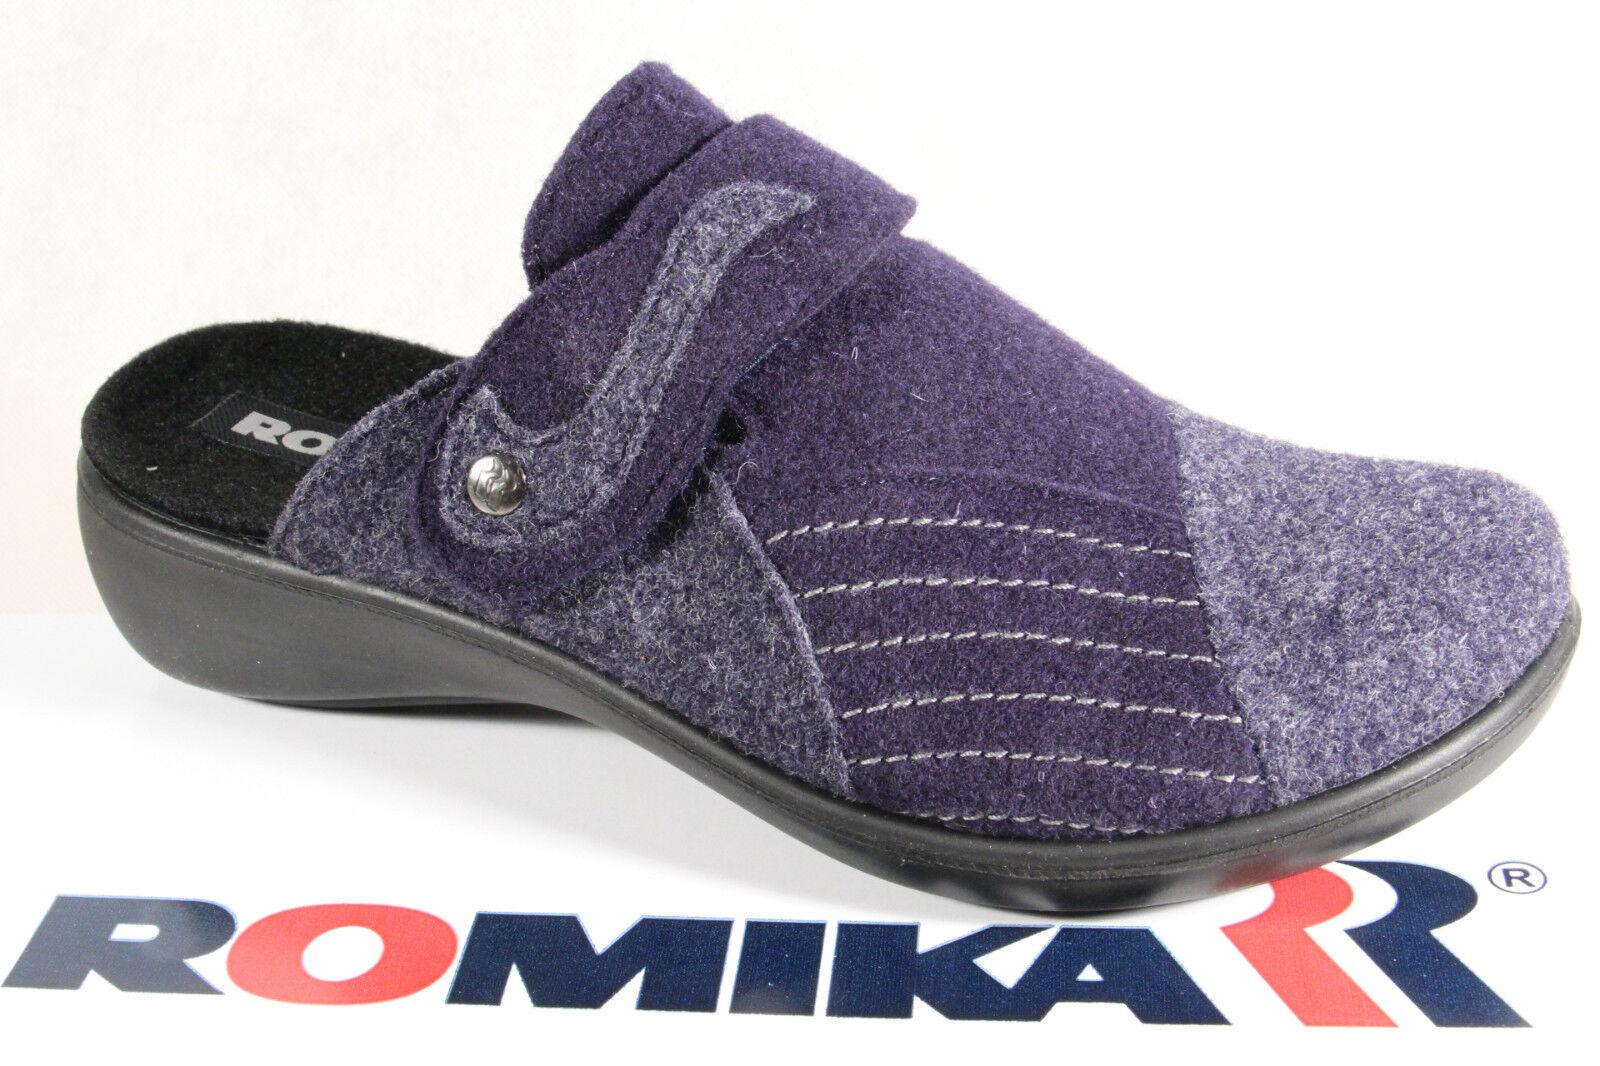 Romika wollfilzinnensohle, Deslizador de señoras, lana suave, wollfilzinnensohle, Romika azul 16306 NUEVO 4e22b7